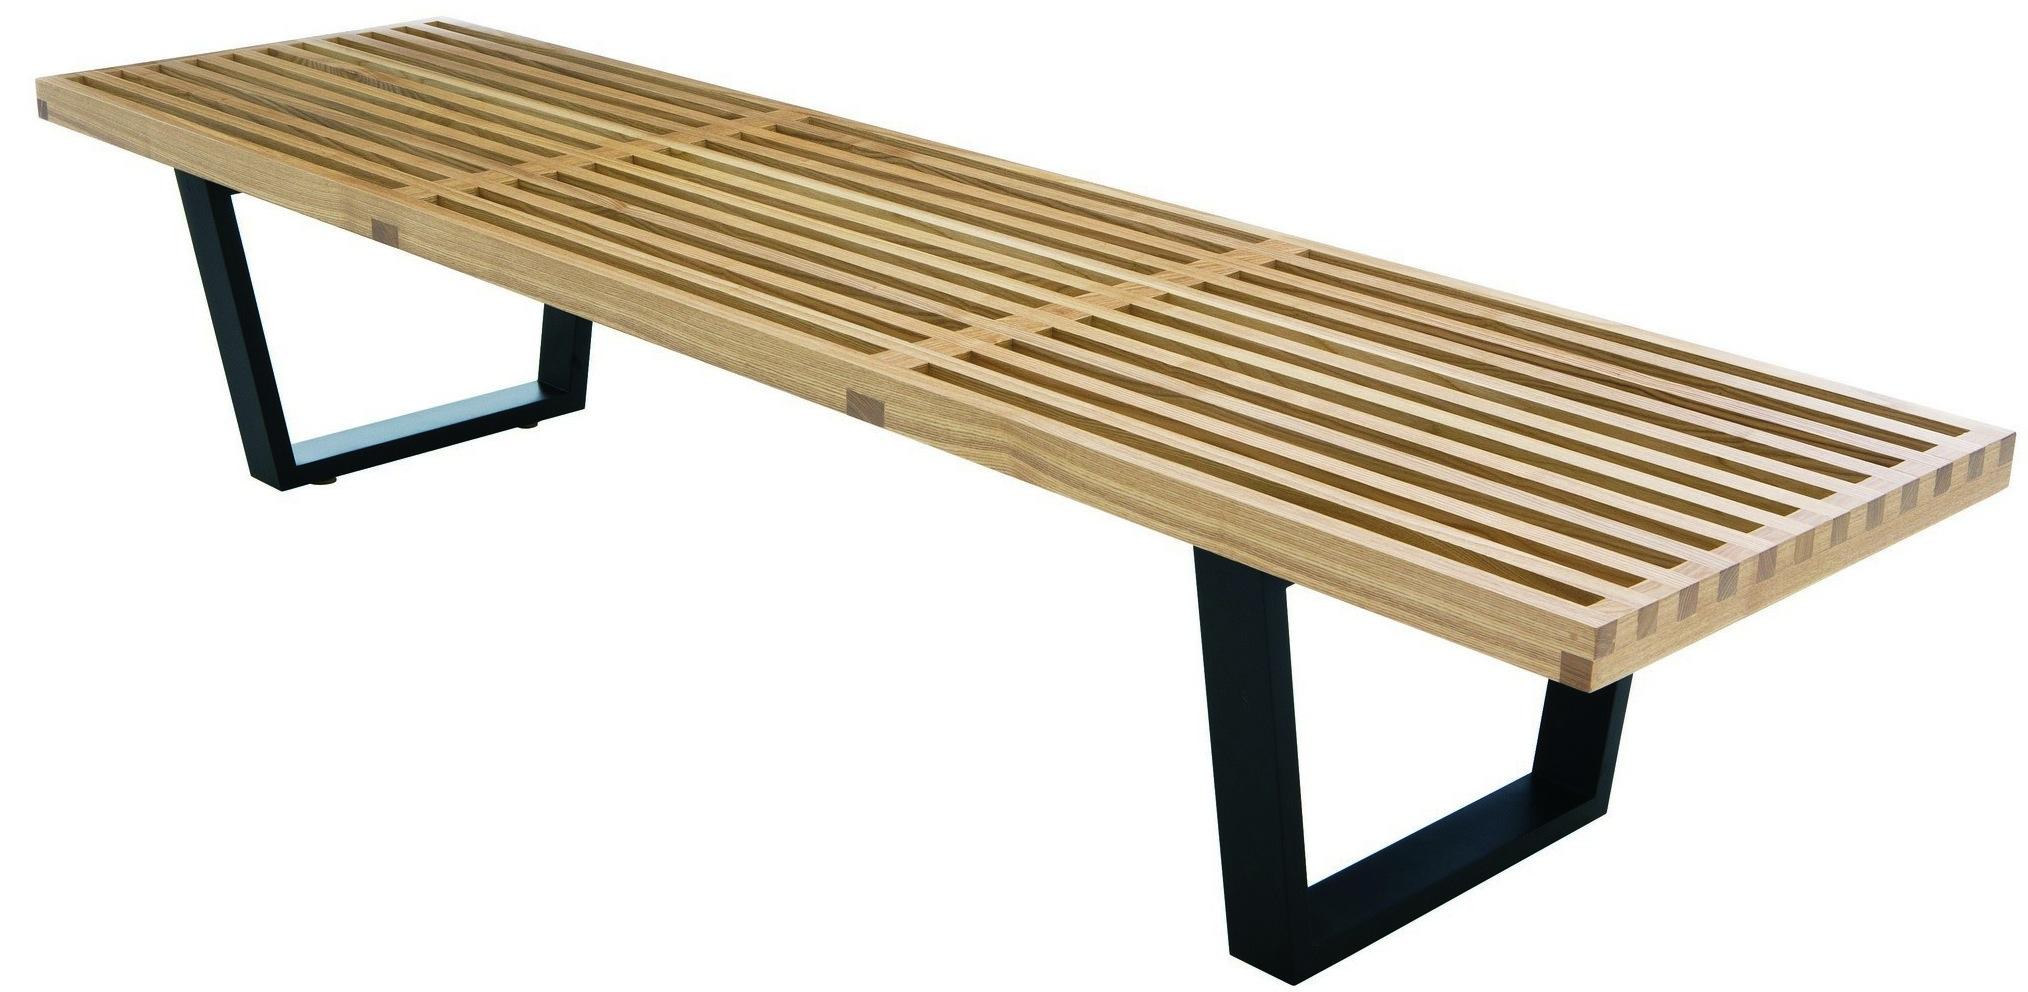 natural-ash-6ft-hardwood-bench.jpg